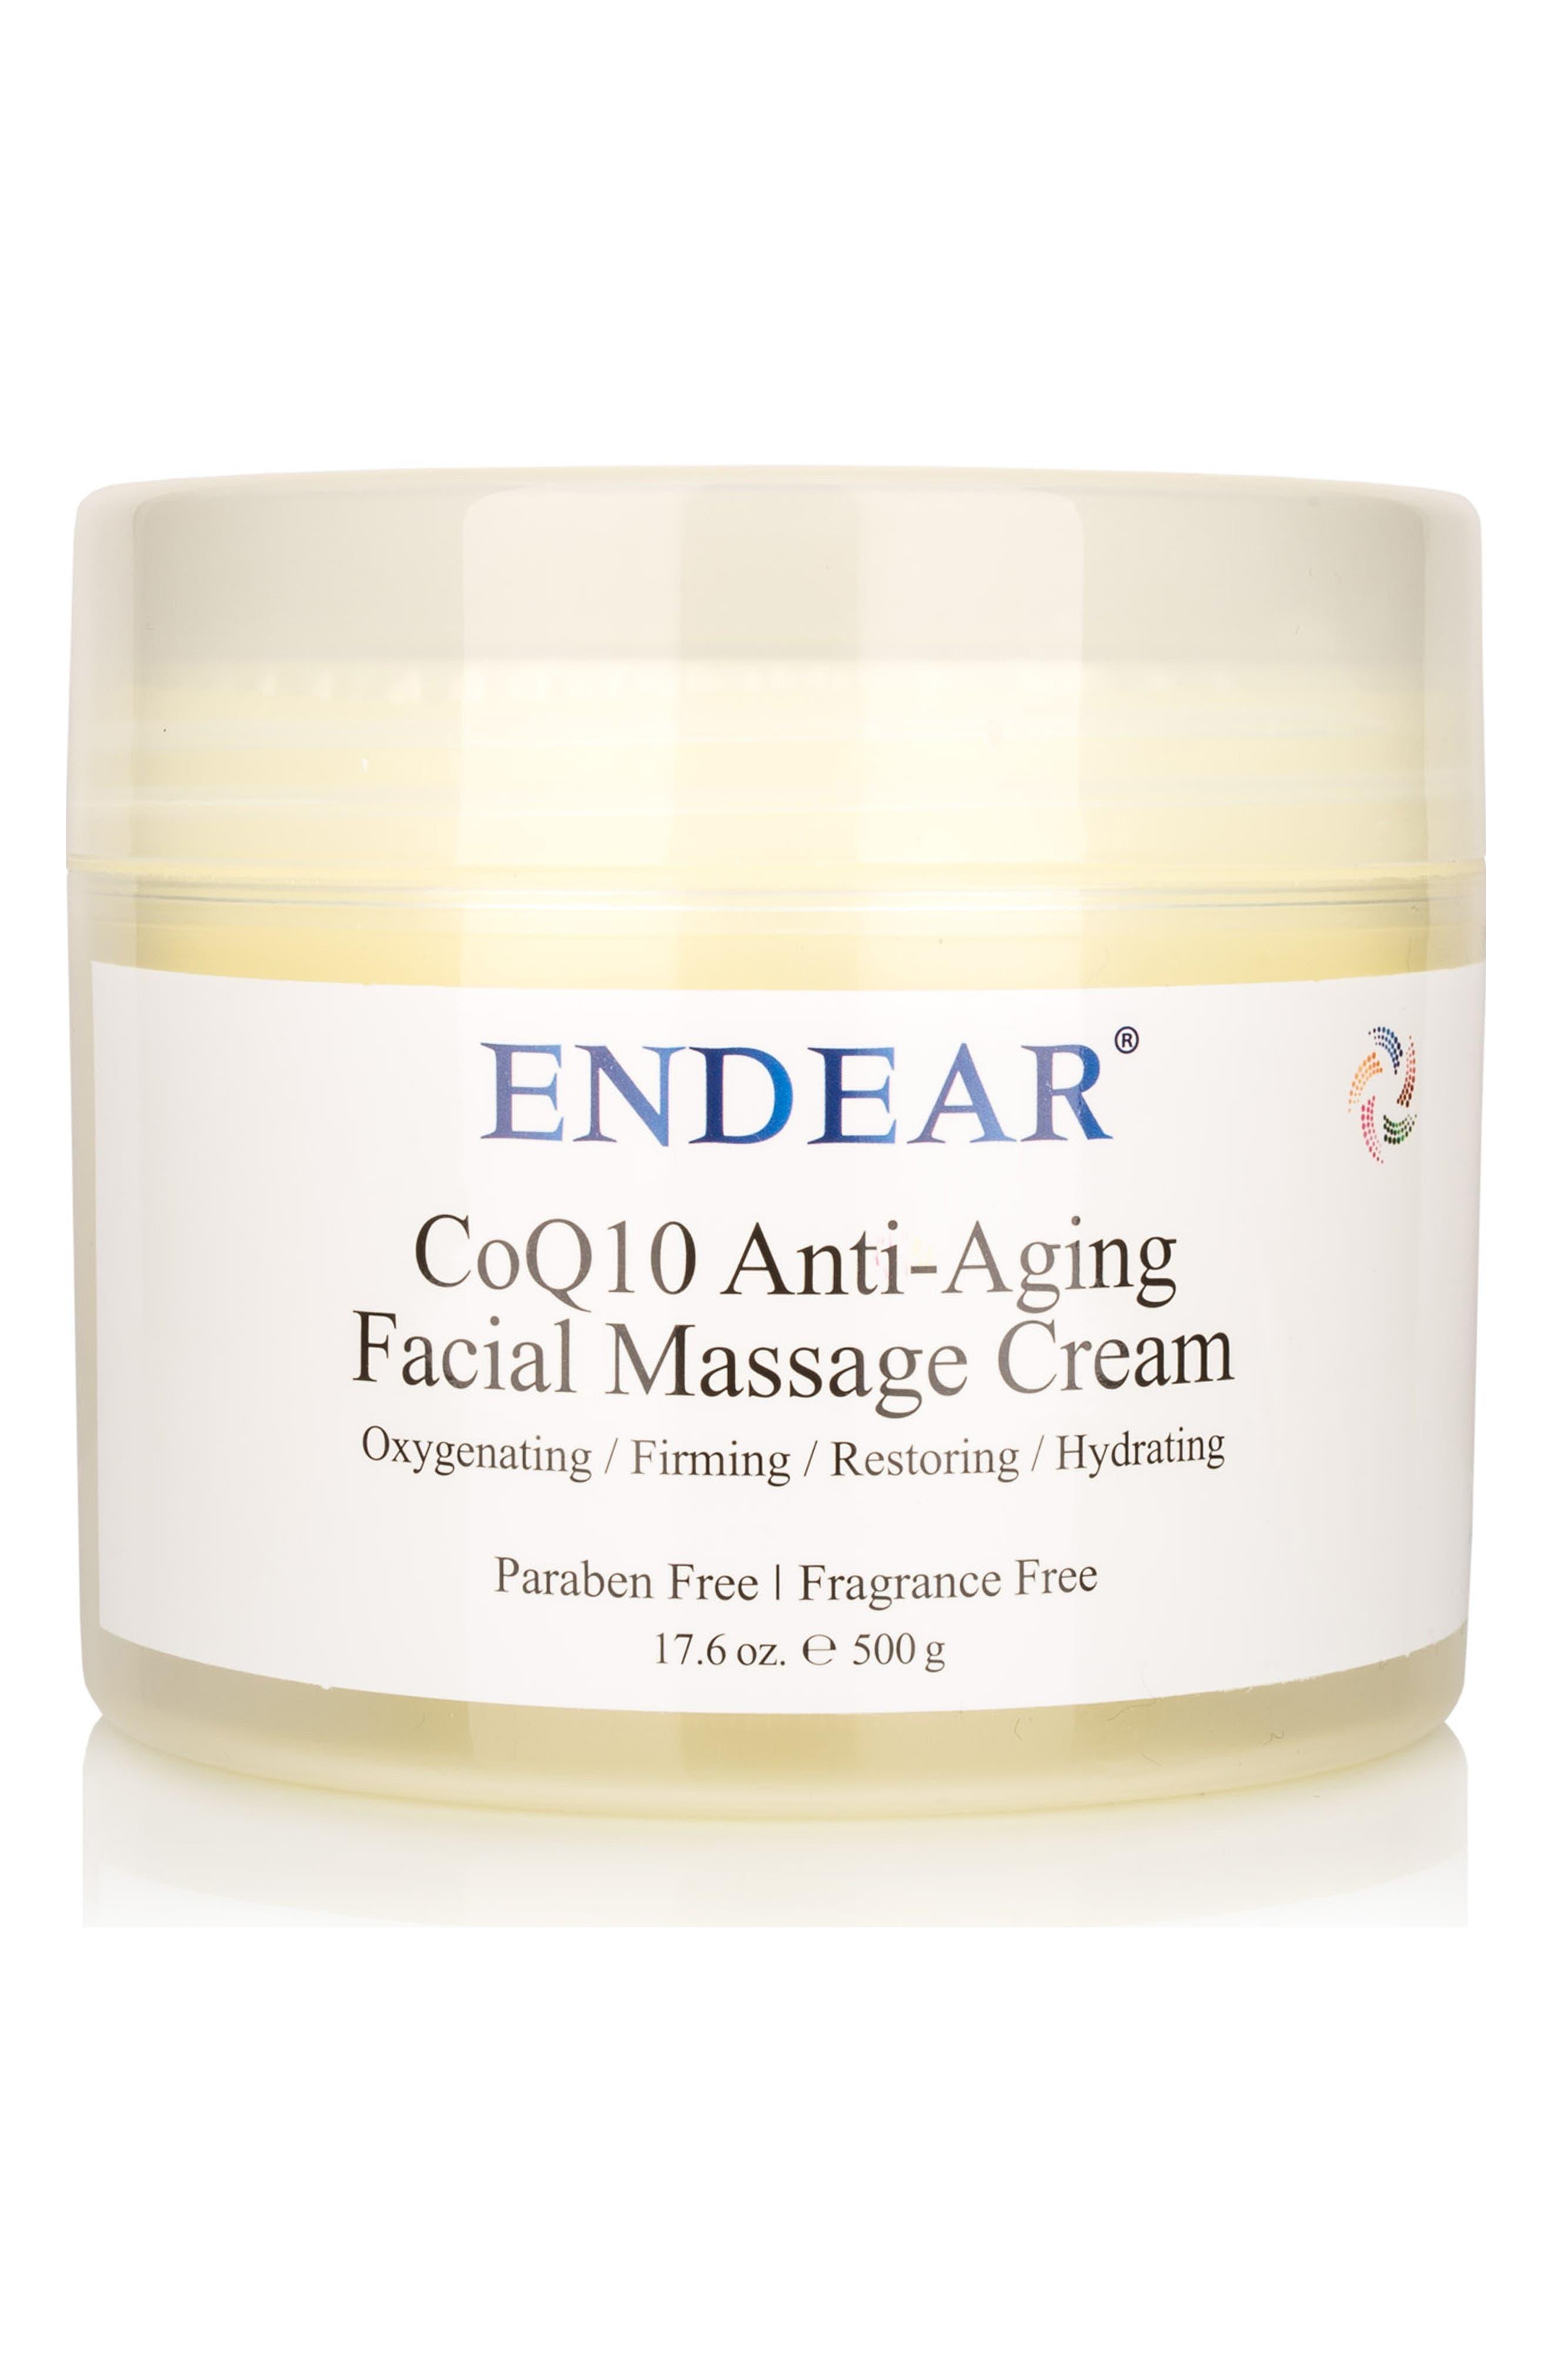 Image of Monar Skincare CoQ10 Anti-Aging Facial Massage Cream